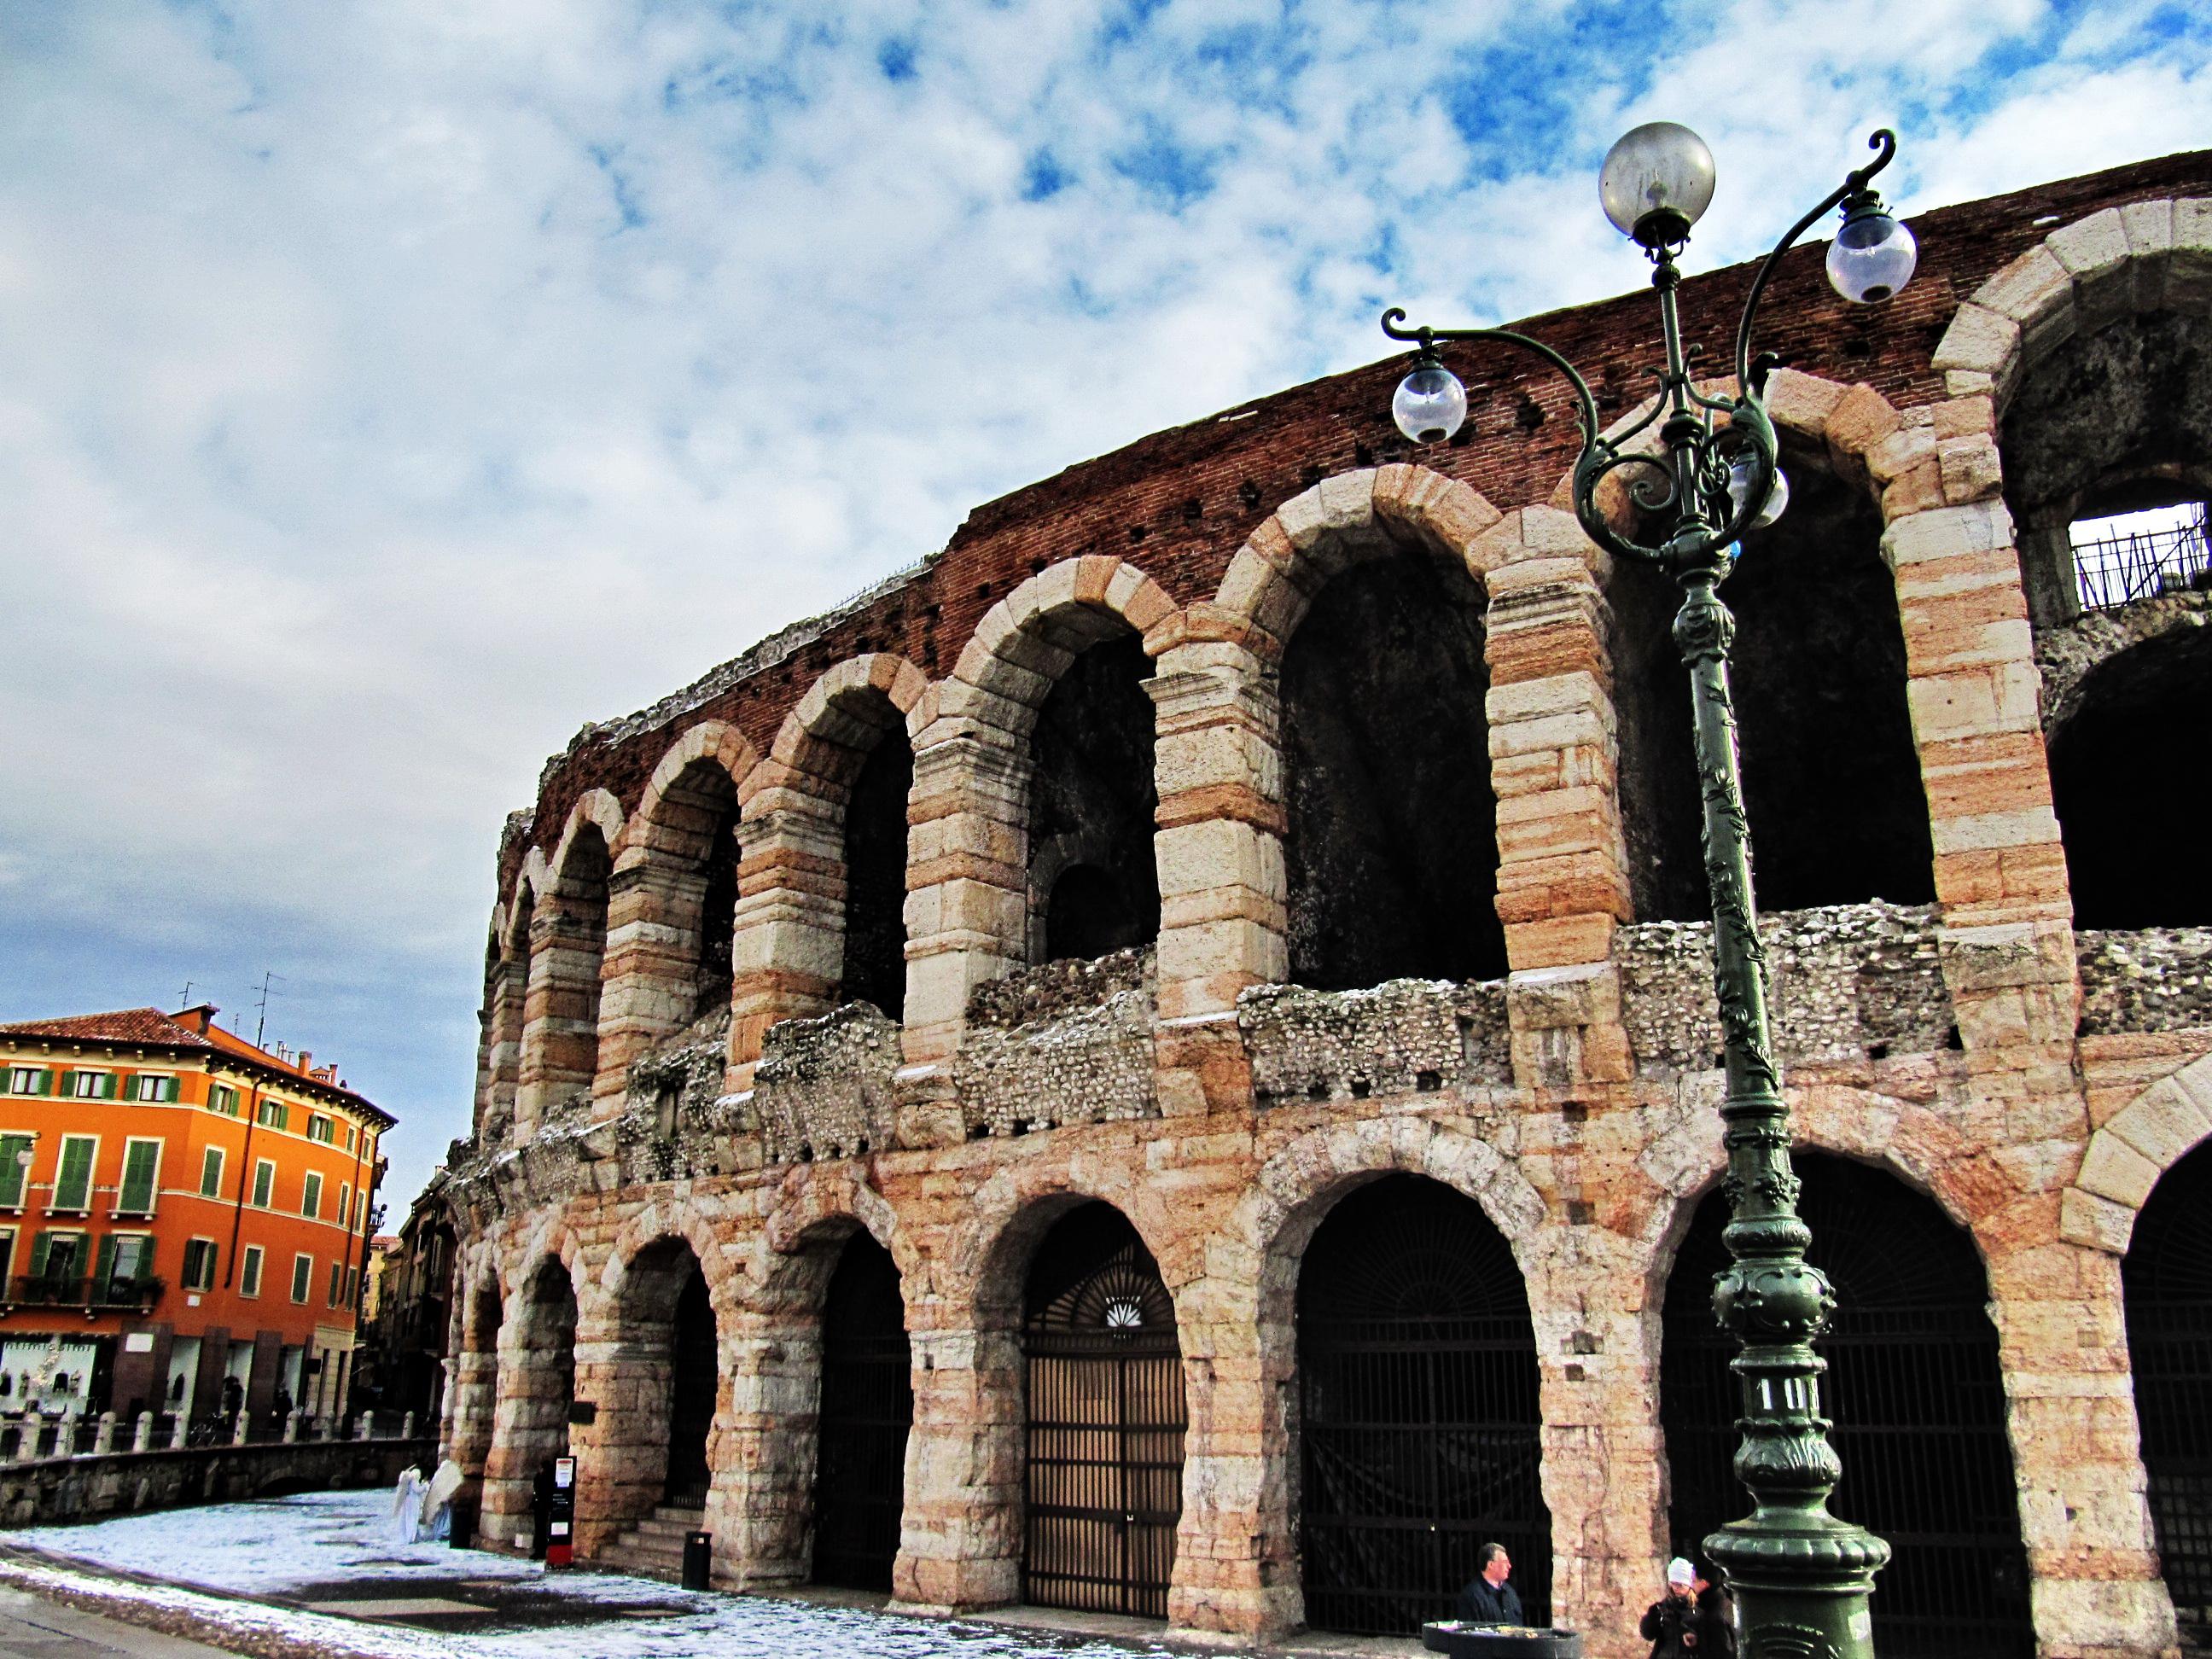 arena_di_verona_original_theatr